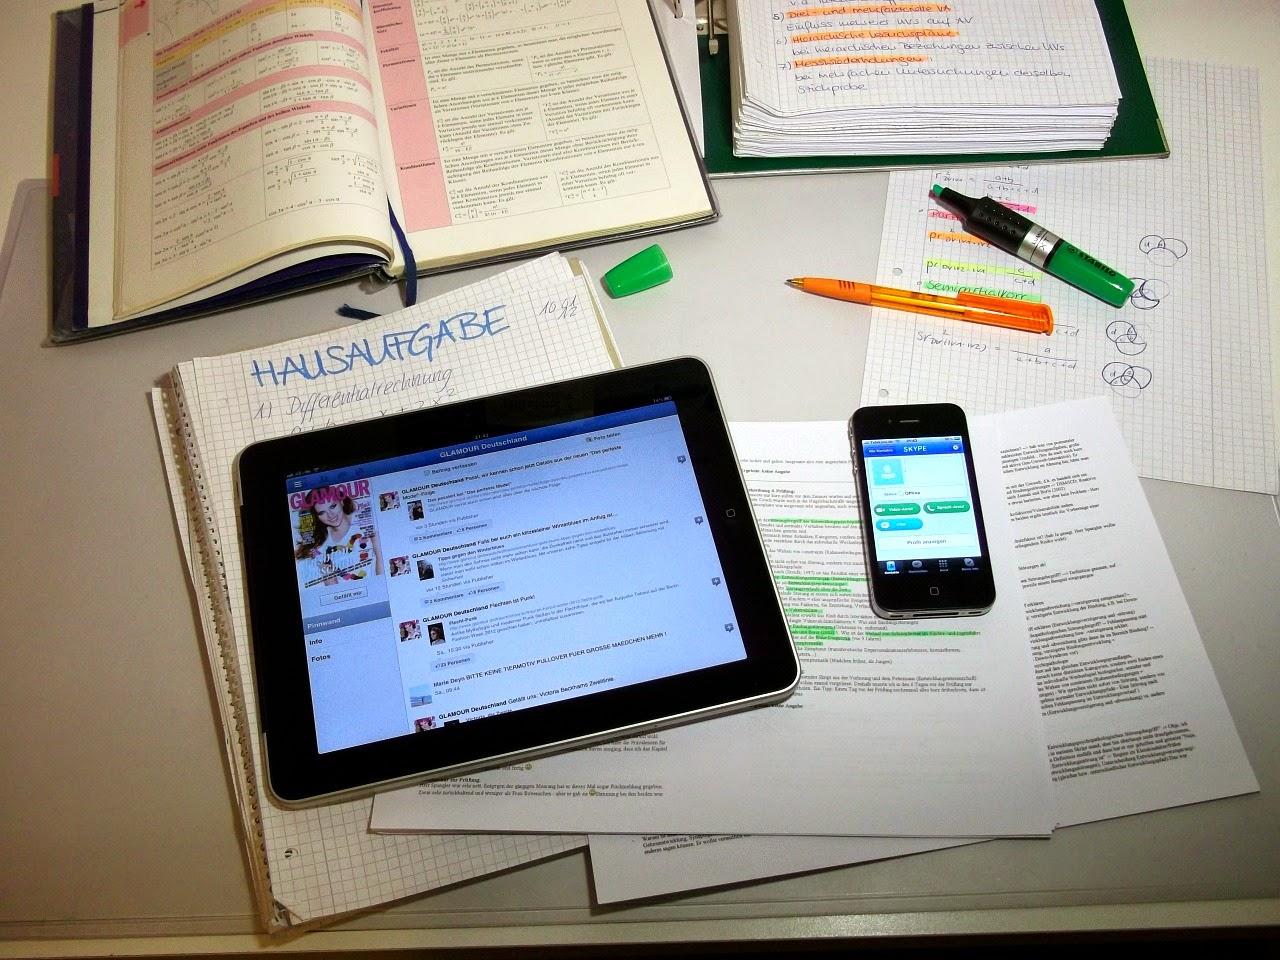 Facebook Addiction Overuse Tablet Smartphone